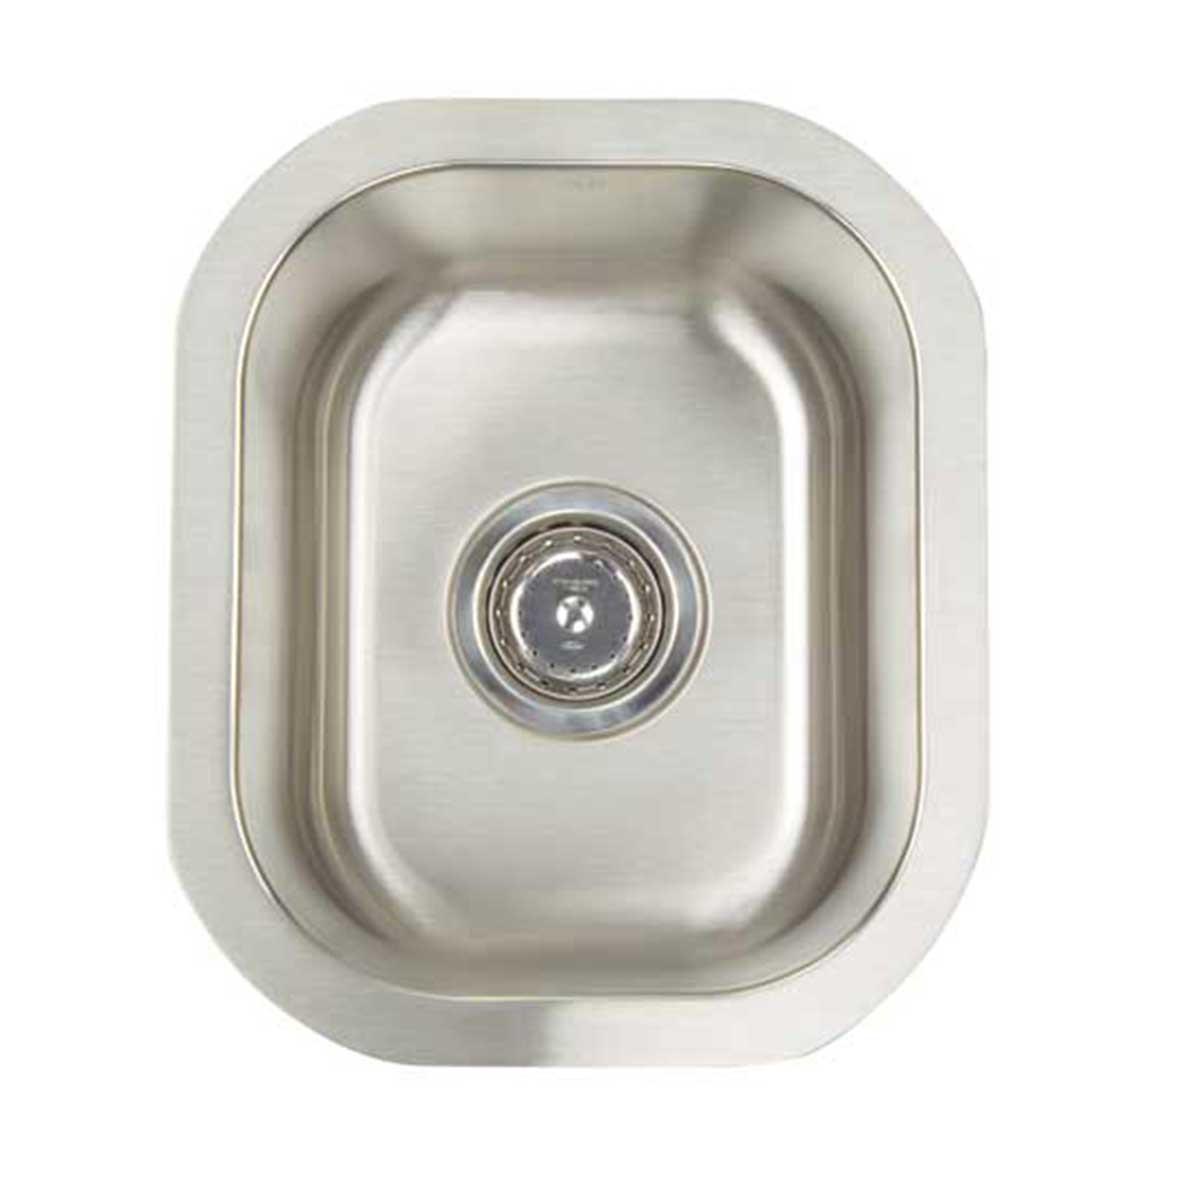 Artisan Sinks 16 Gauge AR1214-D7